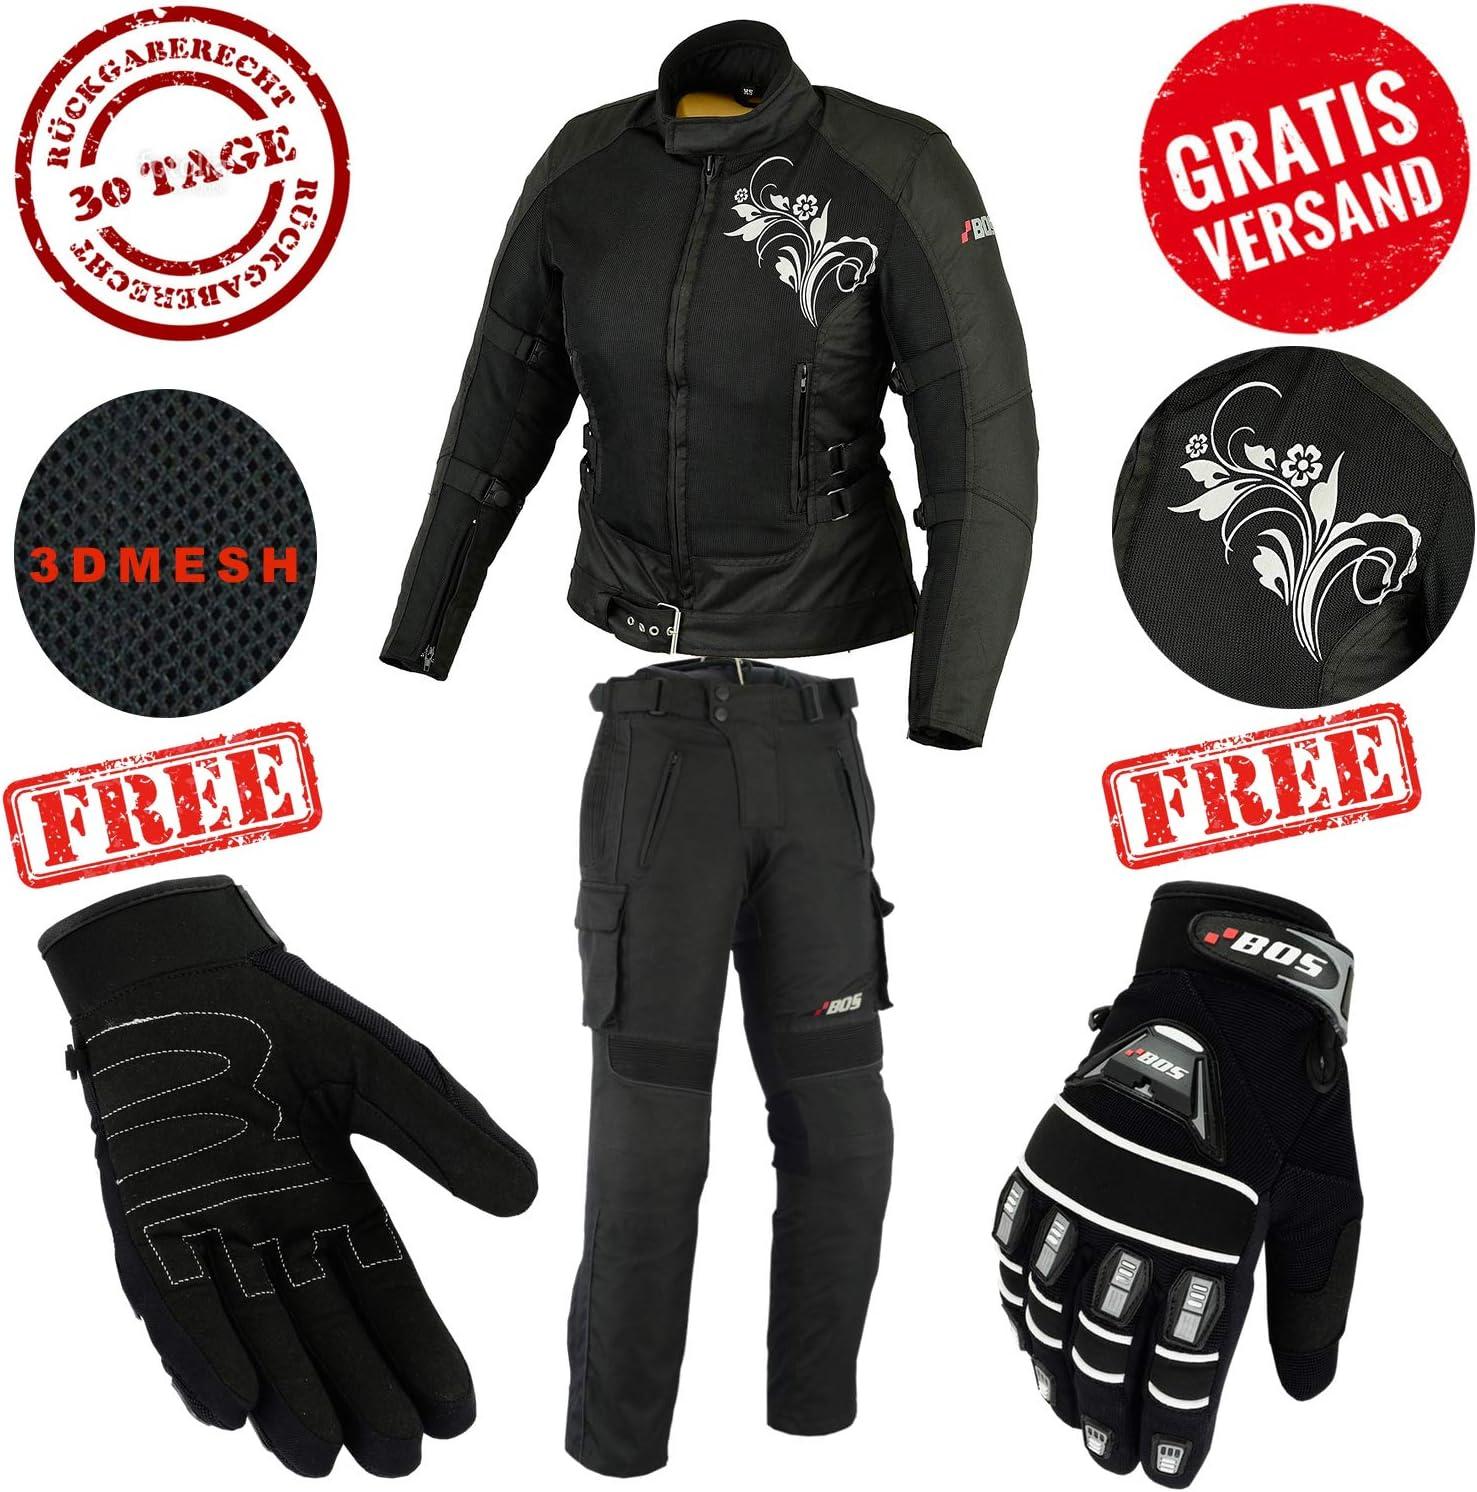 XS BOS Damen Motorrad Jacke Motorradjacke Textil Schwarz